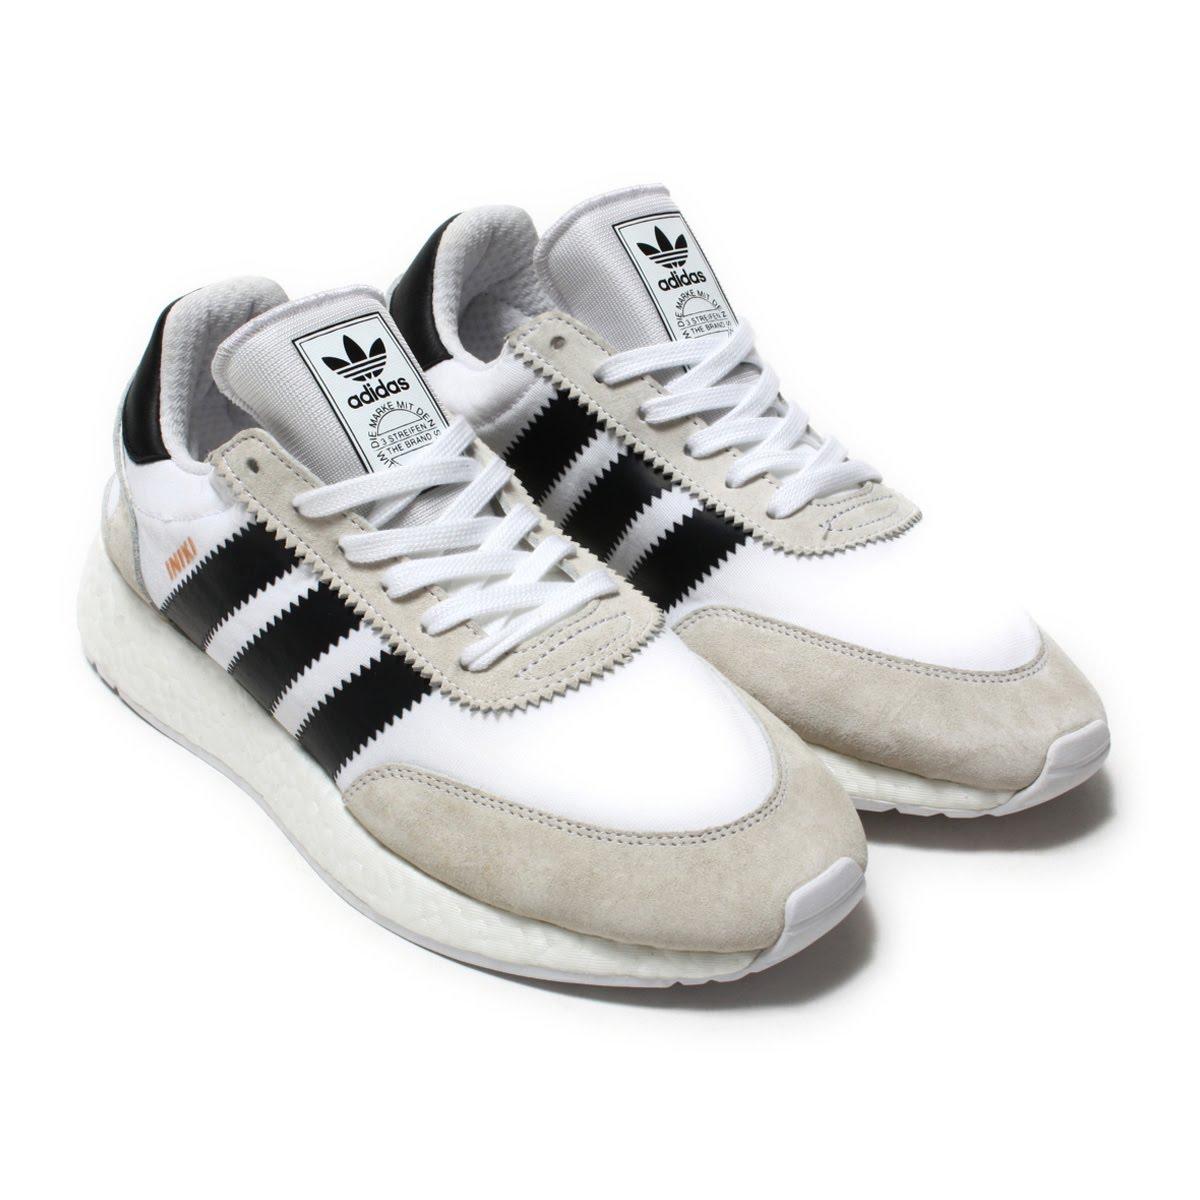 adidas Originals I-5923 (アディダス オリジナルス イニキ ランナー) Running White/Core Black/Copper Met【メンズ スニーカー】18SS-I